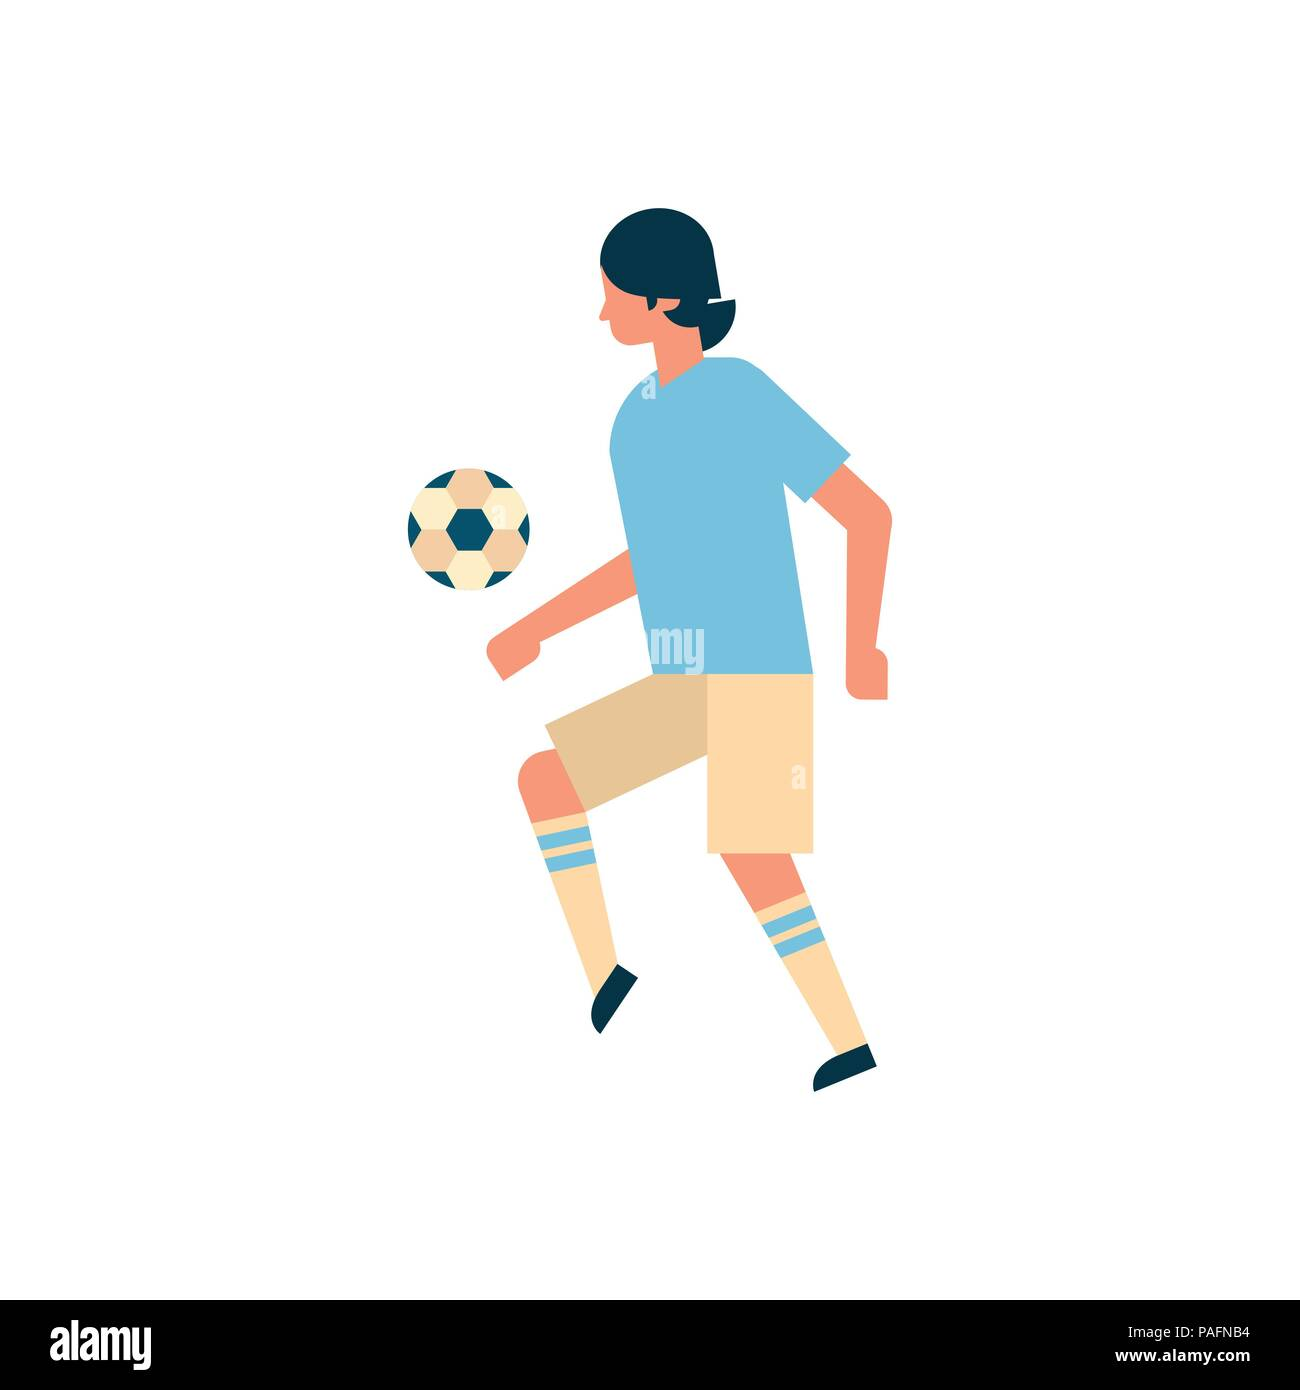 Football player kick ball isolated sport championship flat full length character - Stock Vector